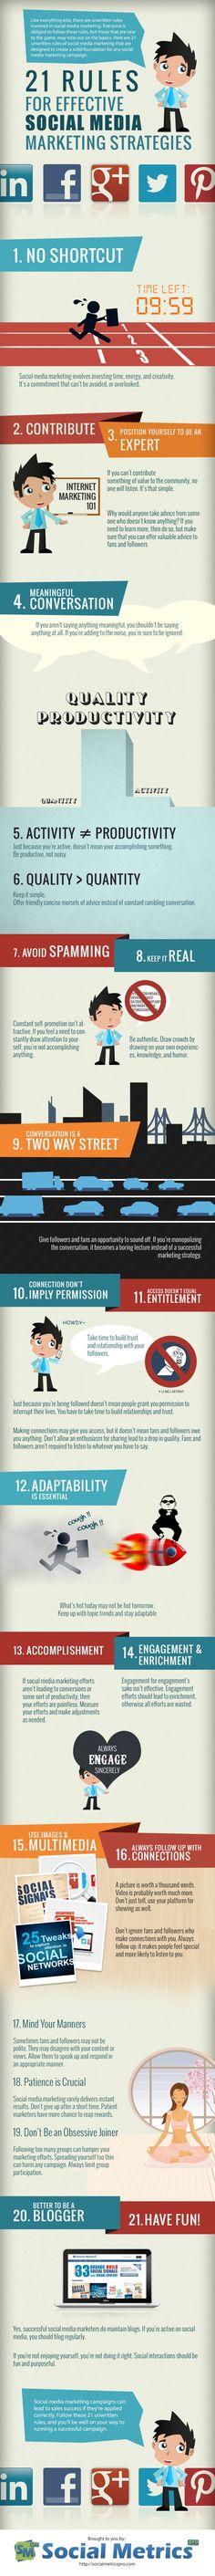 SOCIAL MEDIA -         21 Rules For Effective Social Media Marketing Strategies Infographic #socialmedia.